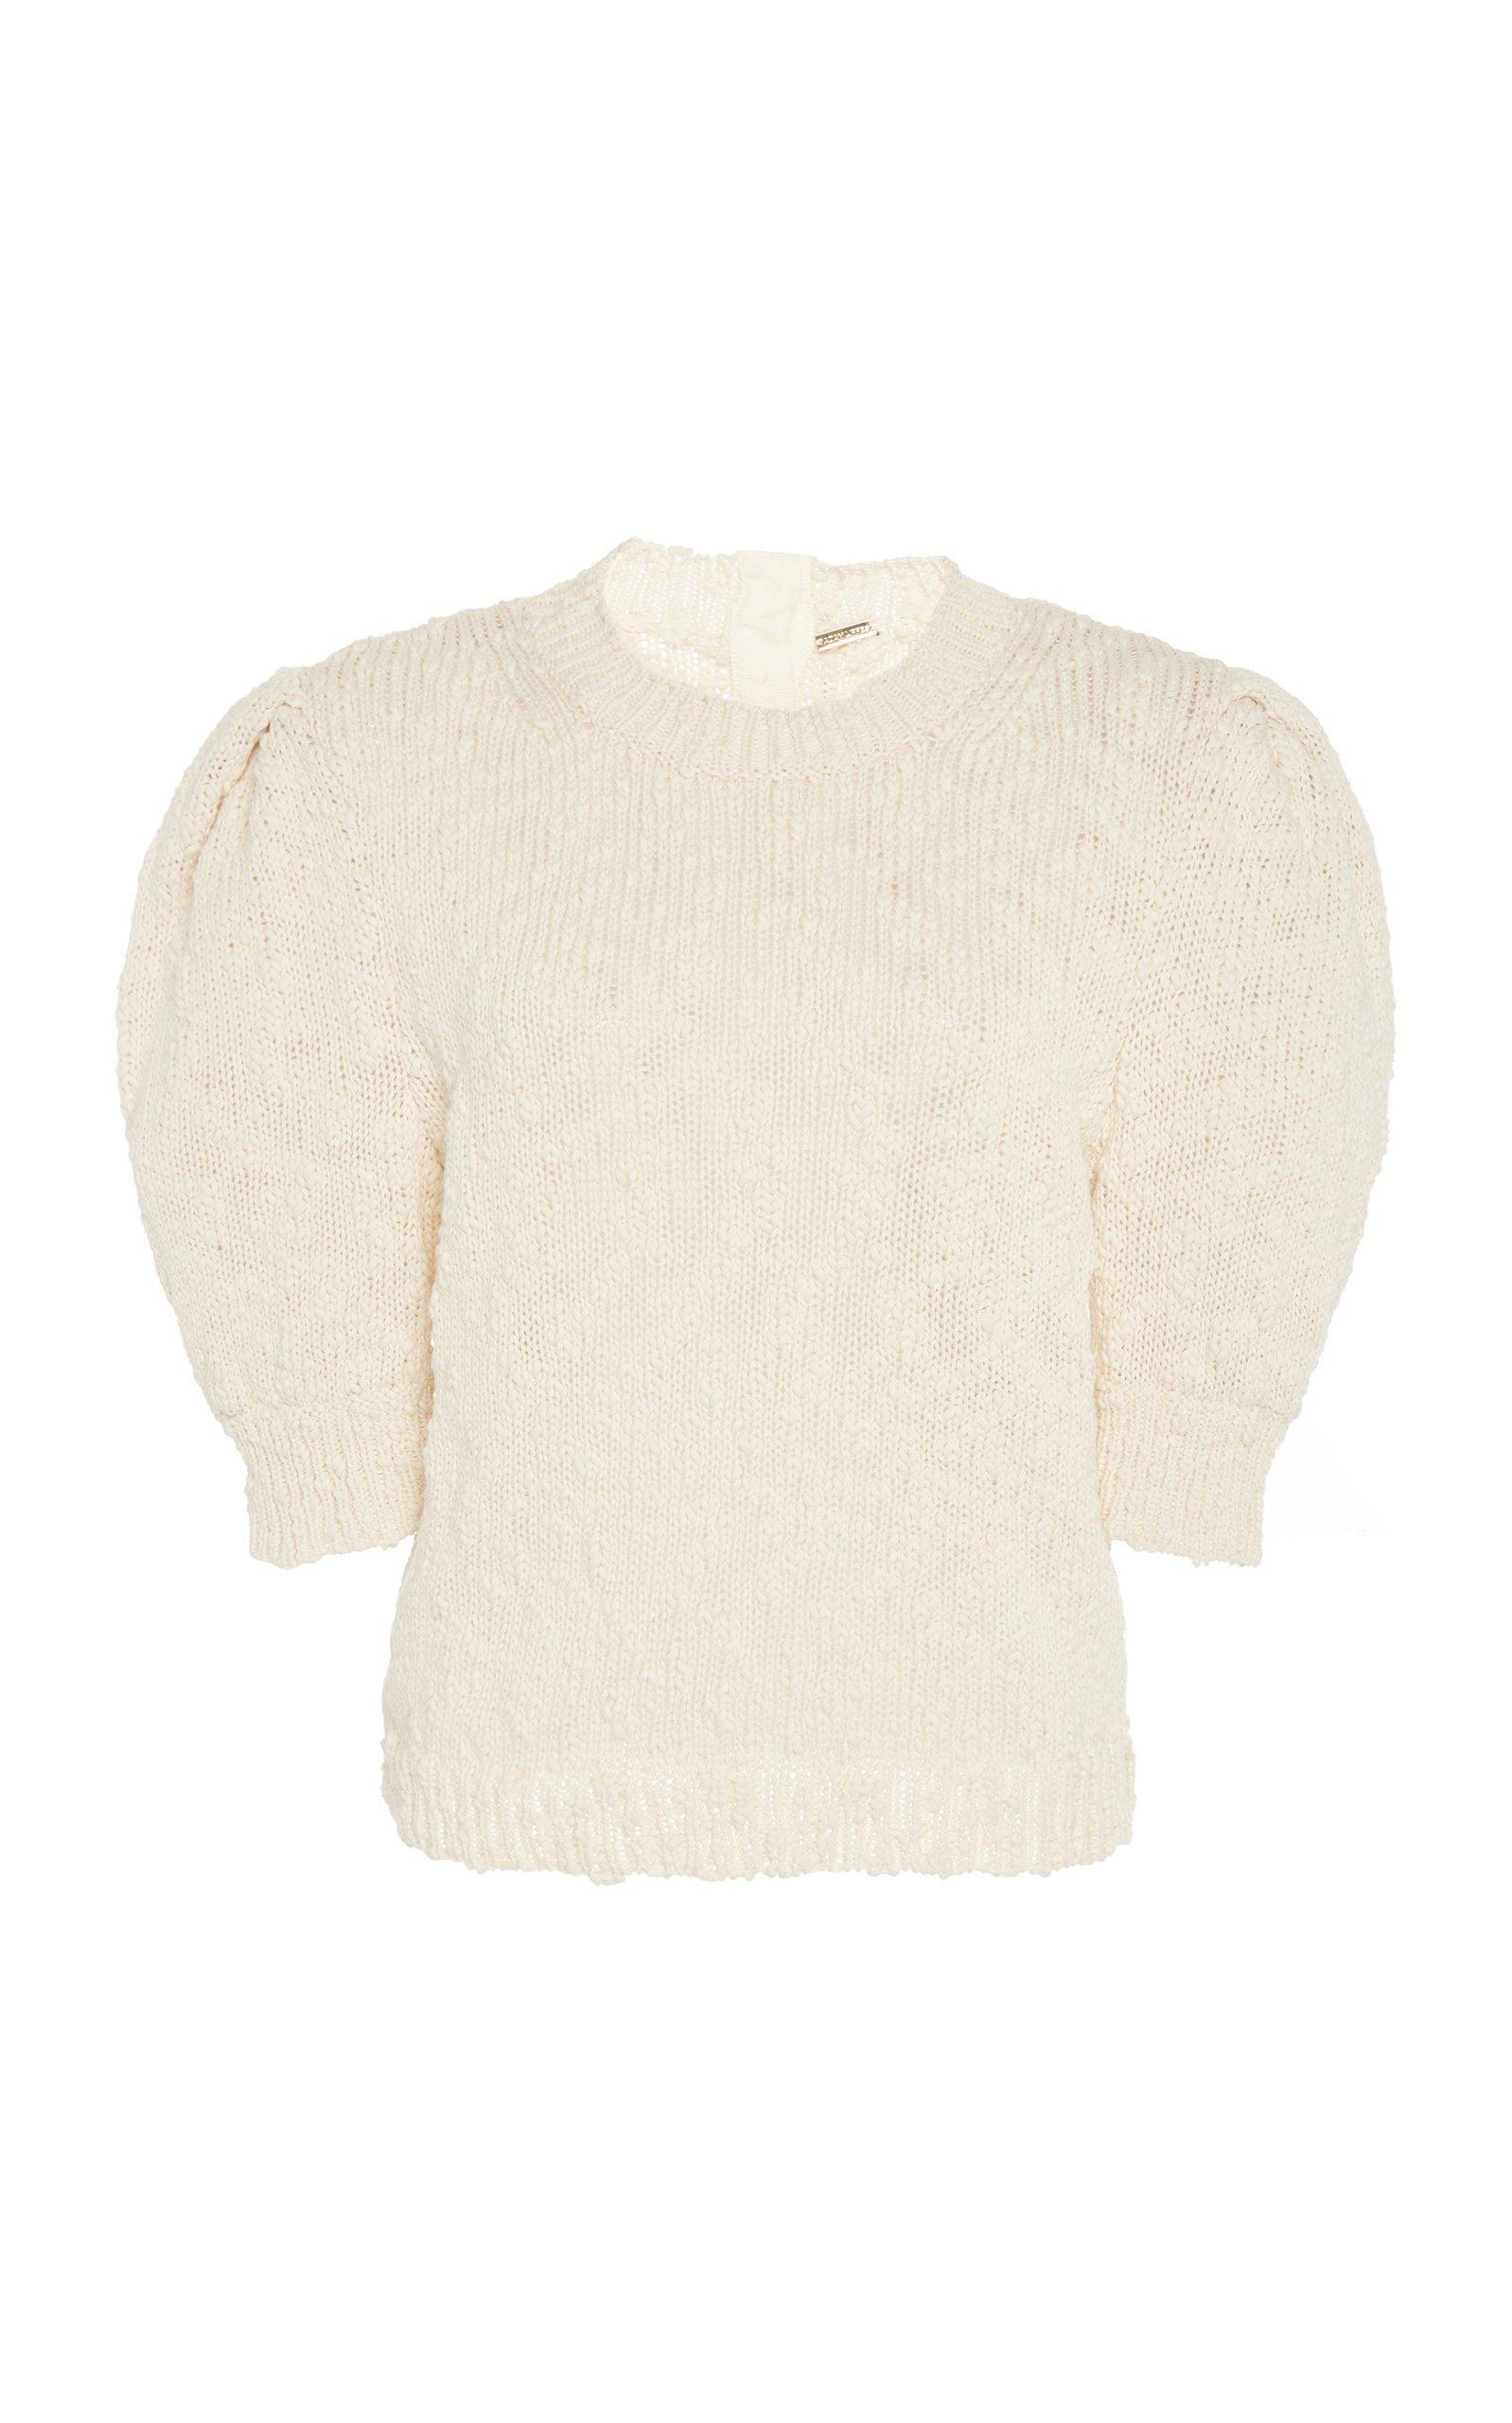 Adam Lippes Textured Cotton Puff Sleeve Knit